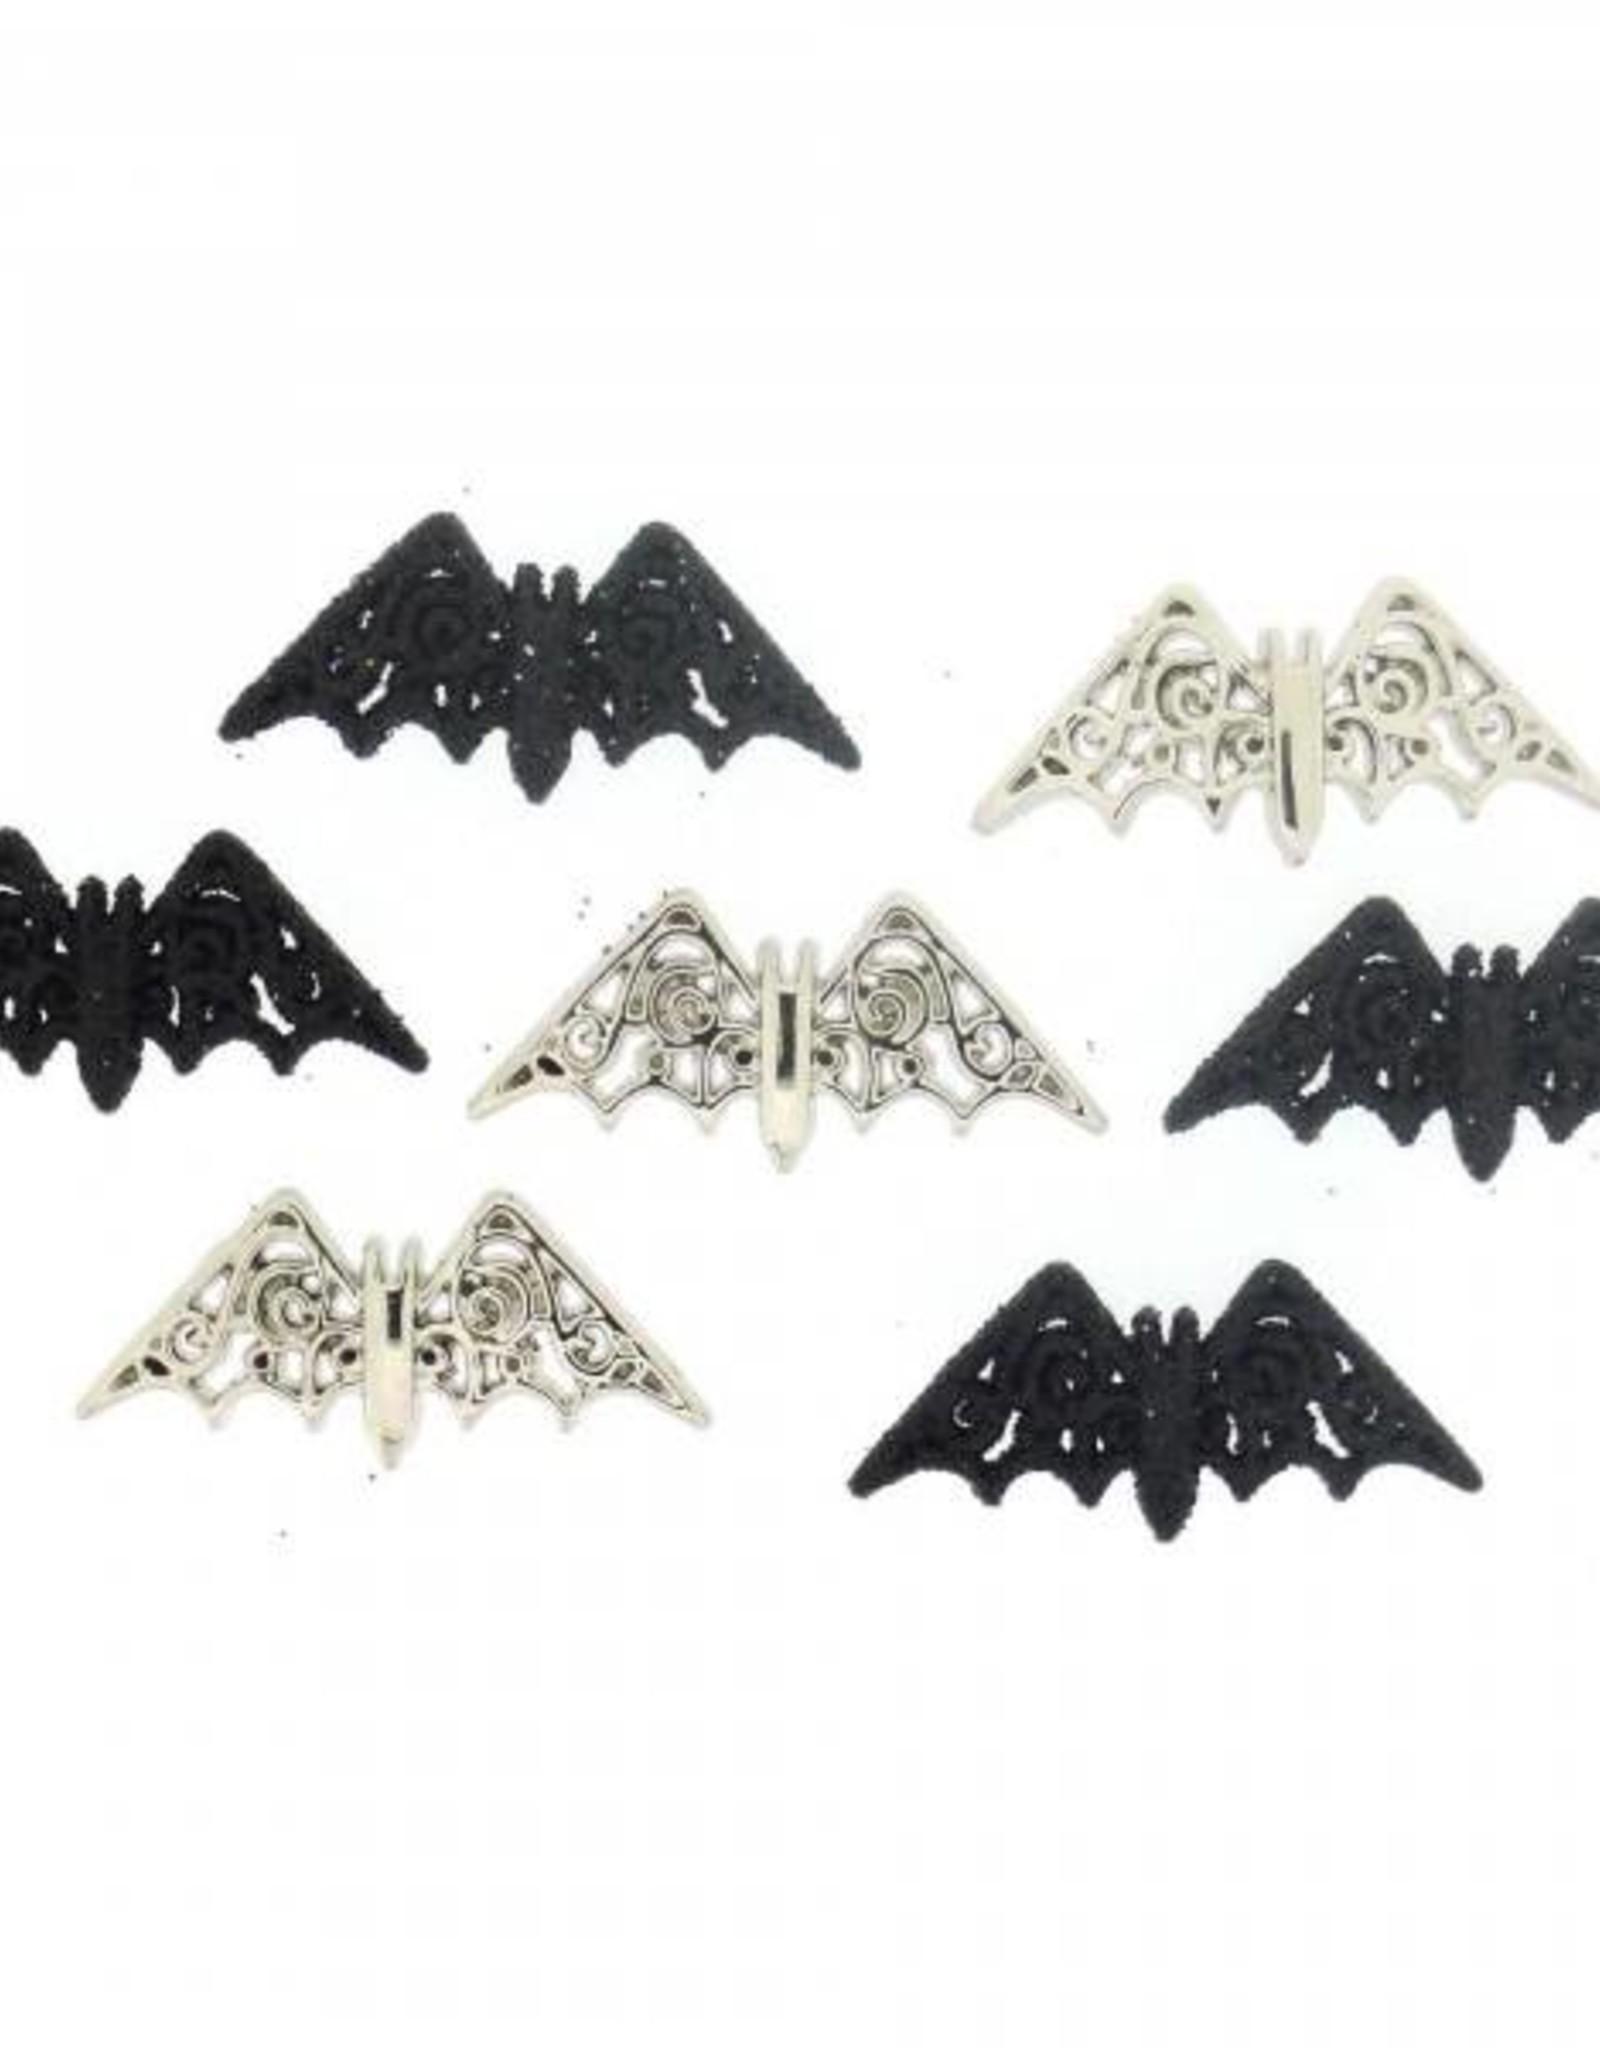 Dress it up 7588 Bewitching Bats